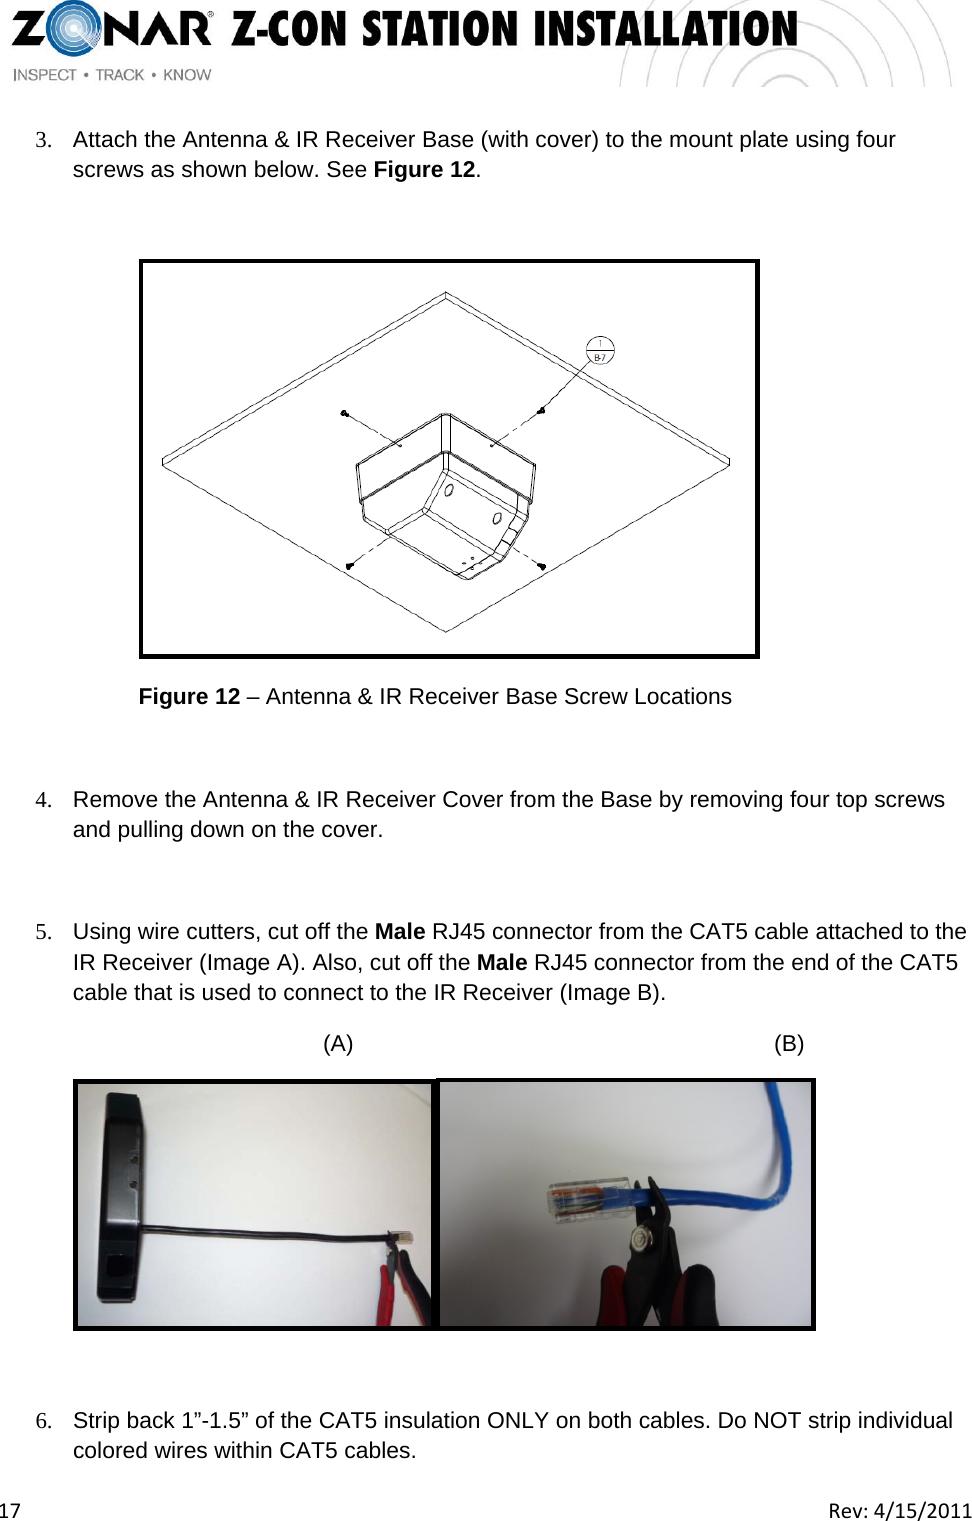 e34 ews wiring diagram e34 water tds levels diagram, Wiring diagram